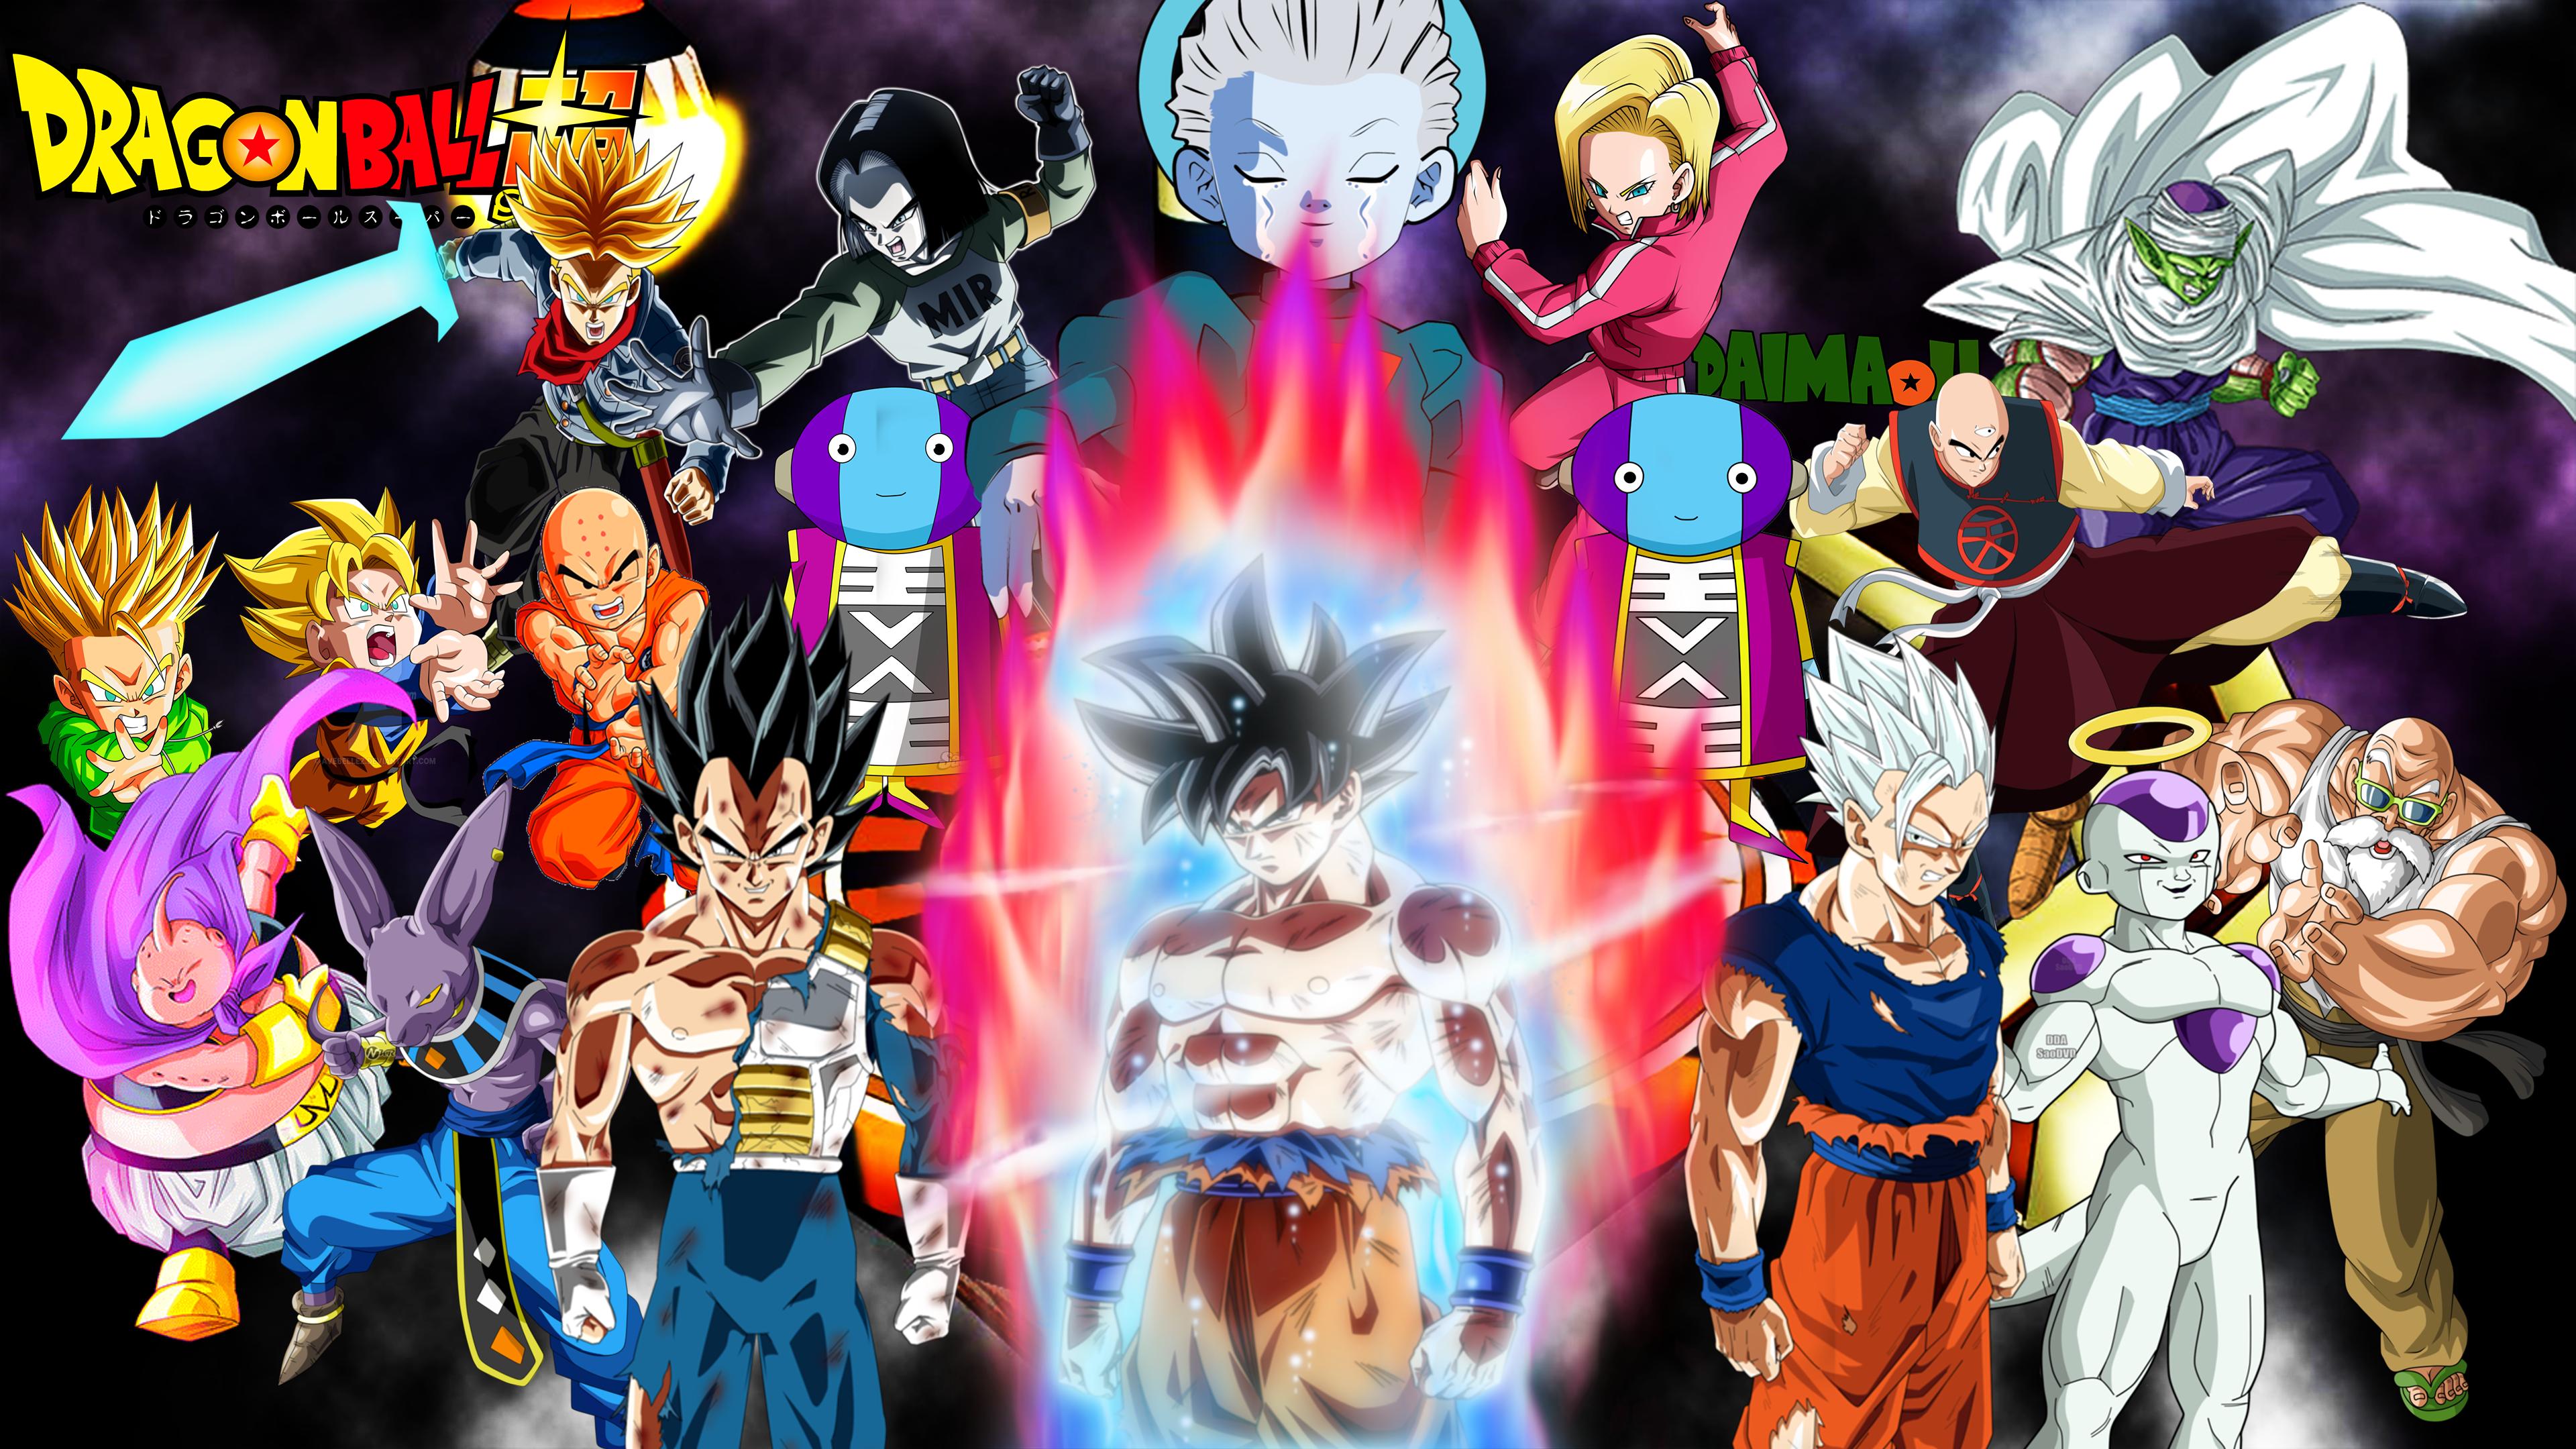 Dragon Ball Super  The Final War by daimaoha5a4 on DeviantArt